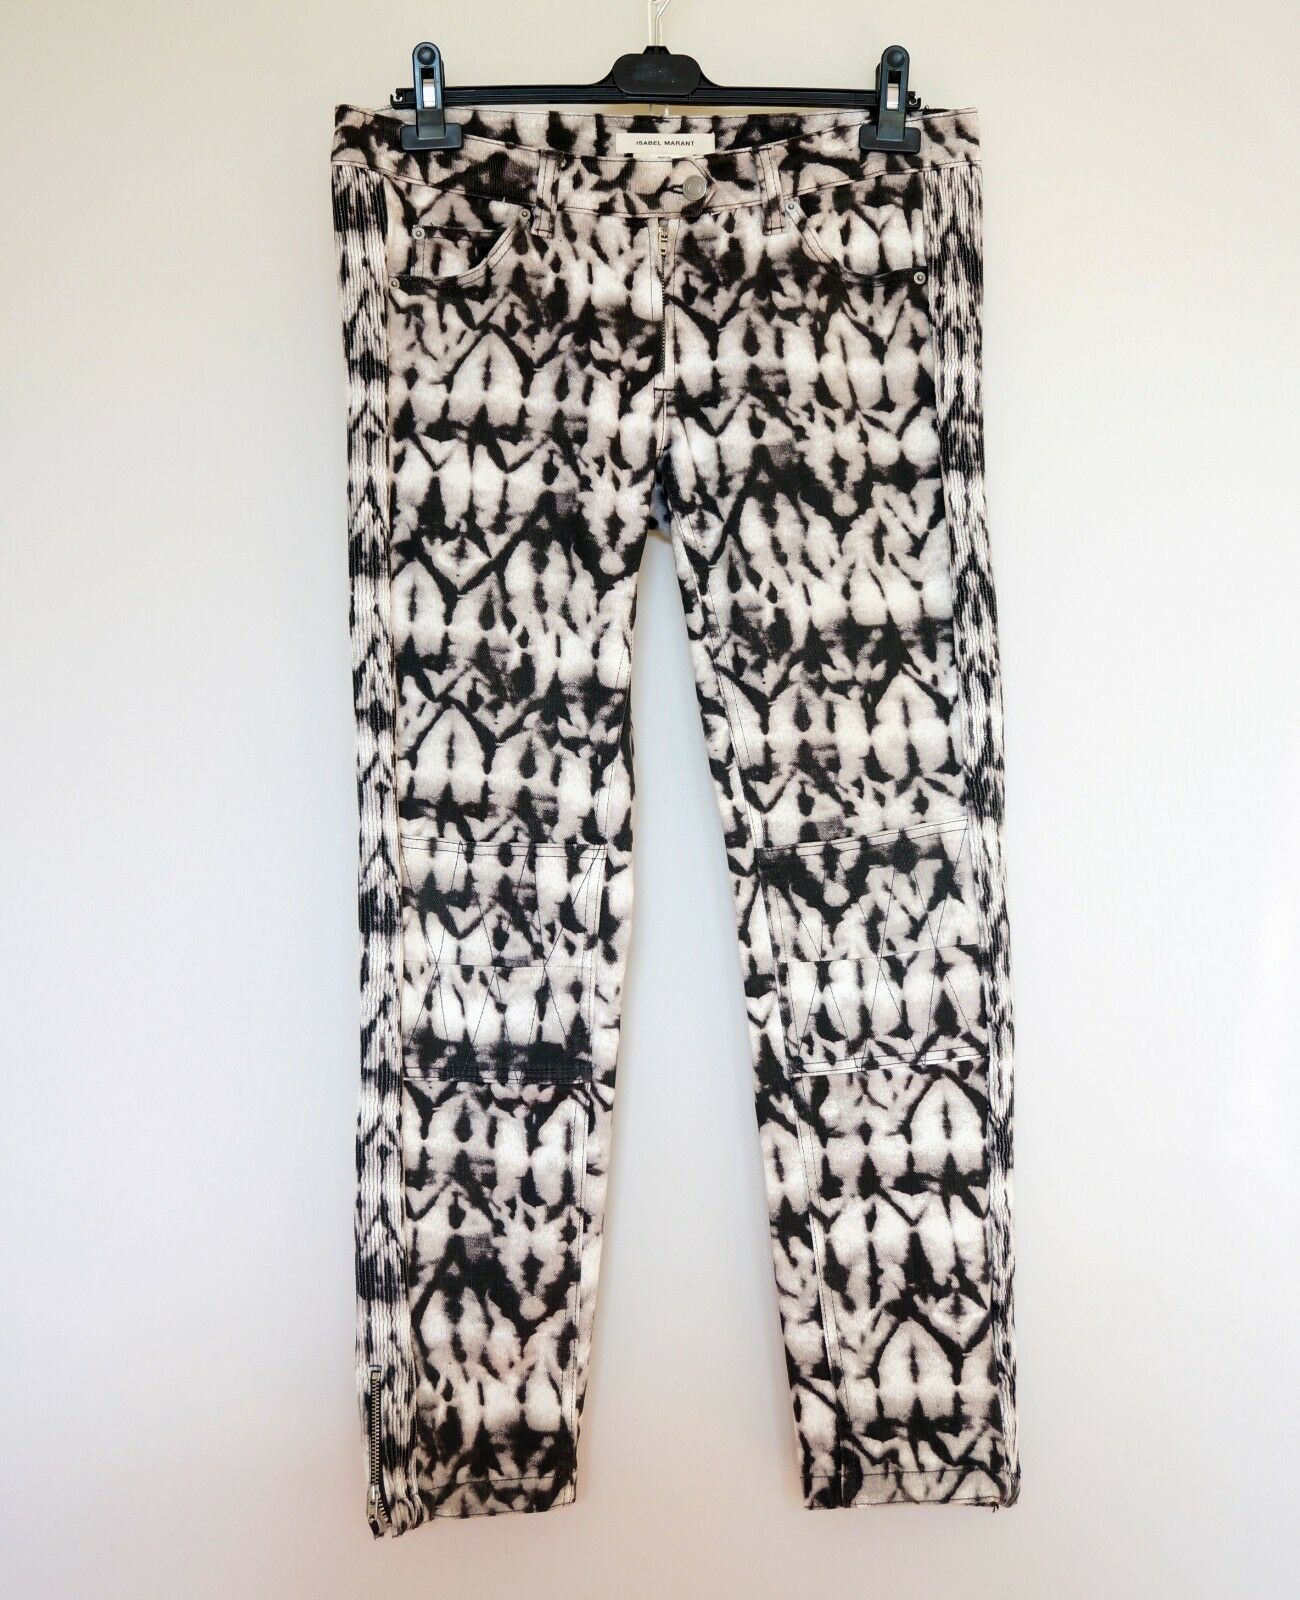 Isabel Marant Pour H&M Tie Dye Skinny Jeans Trousers Pants , Size